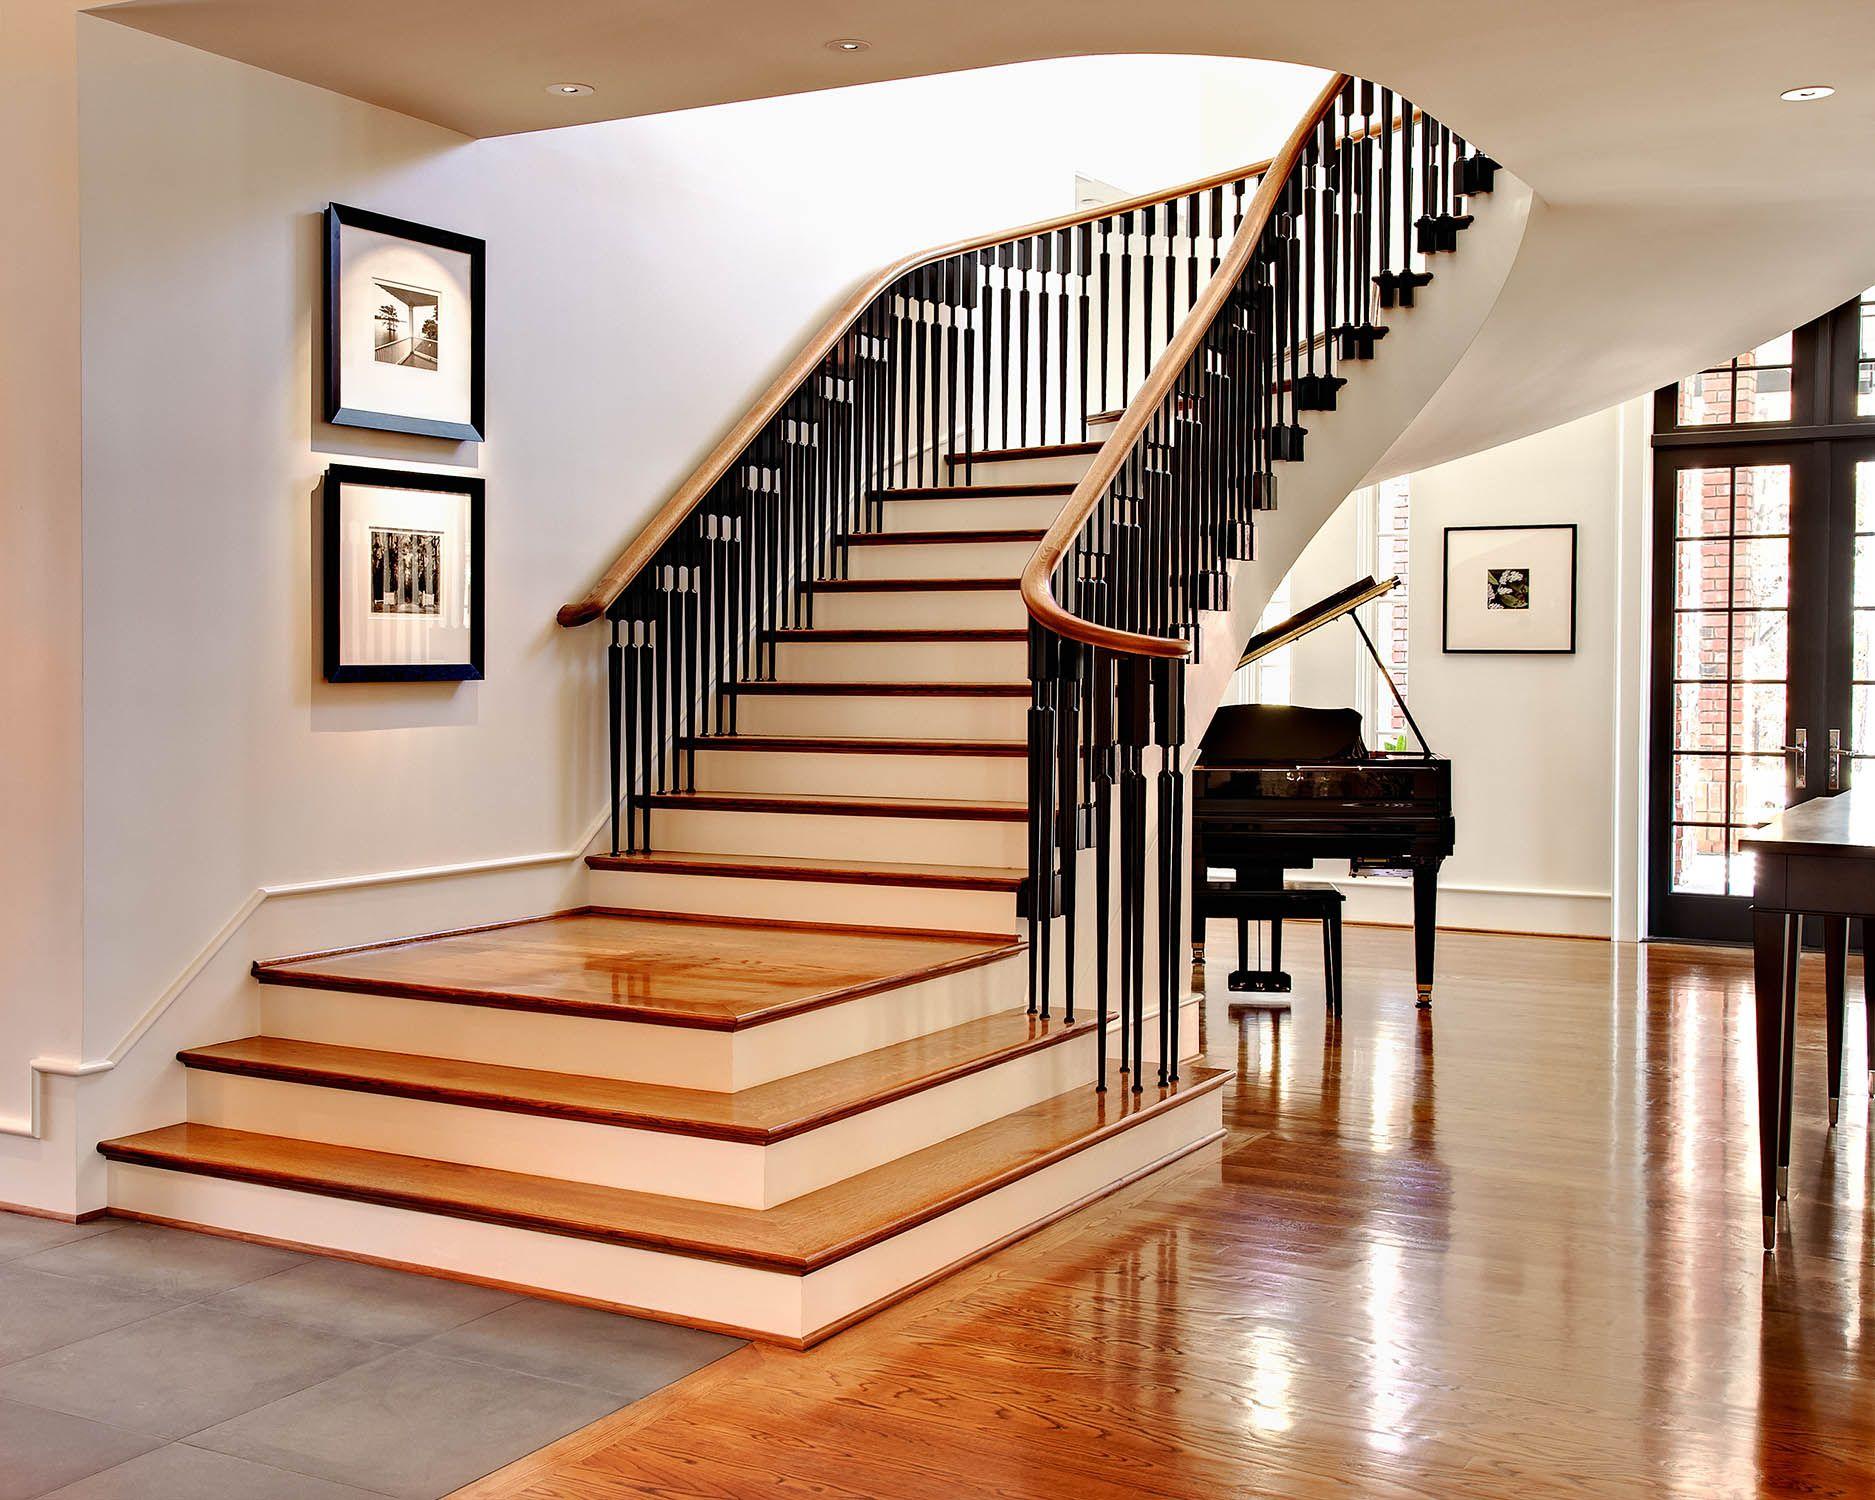 jlcs luxury interiors stairs latex paint ceiling walls 12st rh pinterest com